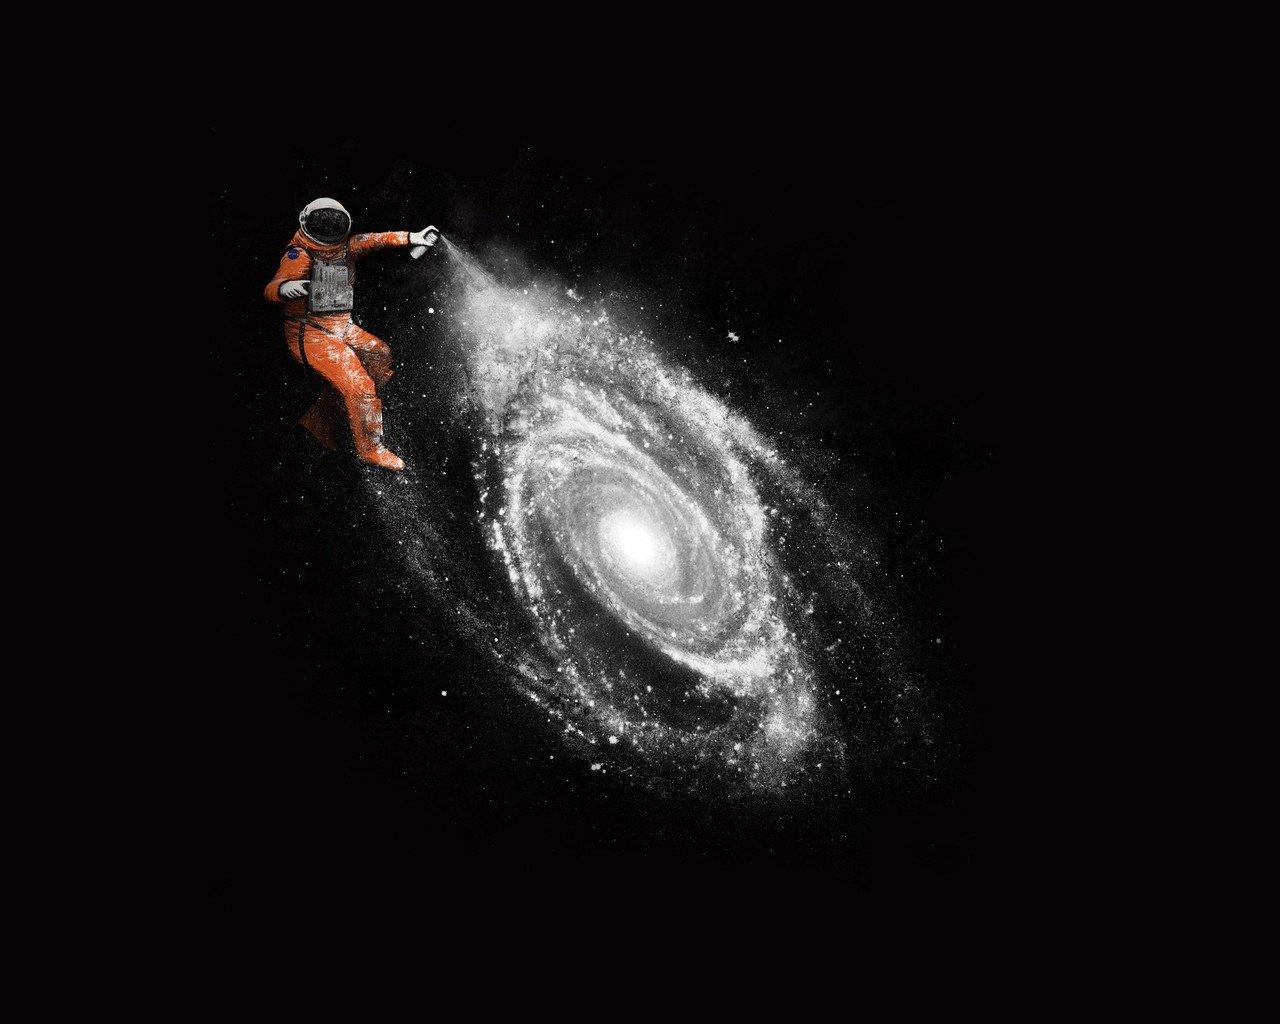 astronaut background hd 1280x1024 101499